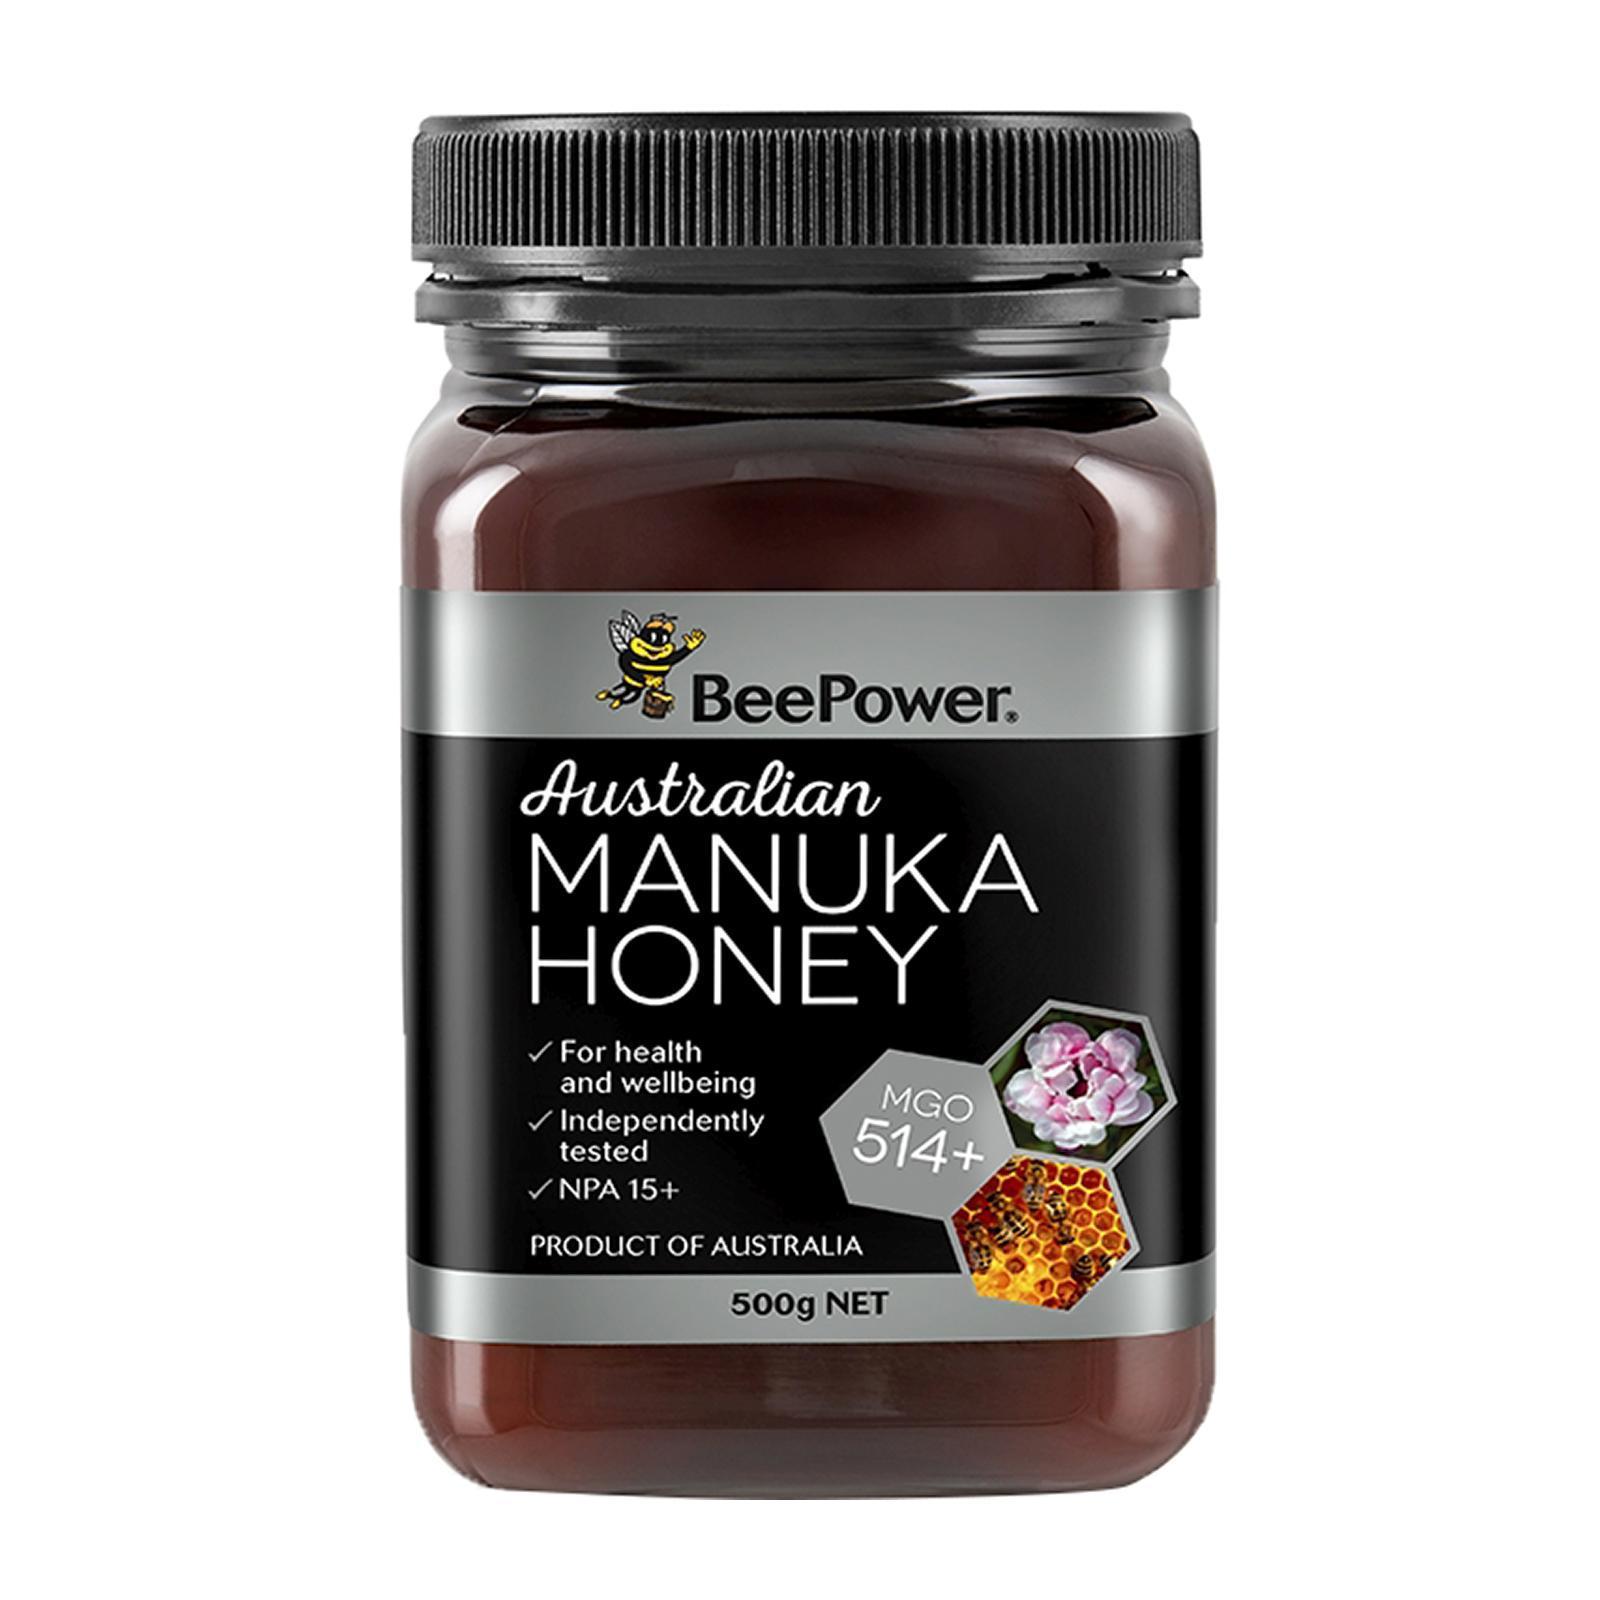 BeePower Australian Manuka Honey MGO 514+ - By Nature's Nutrition